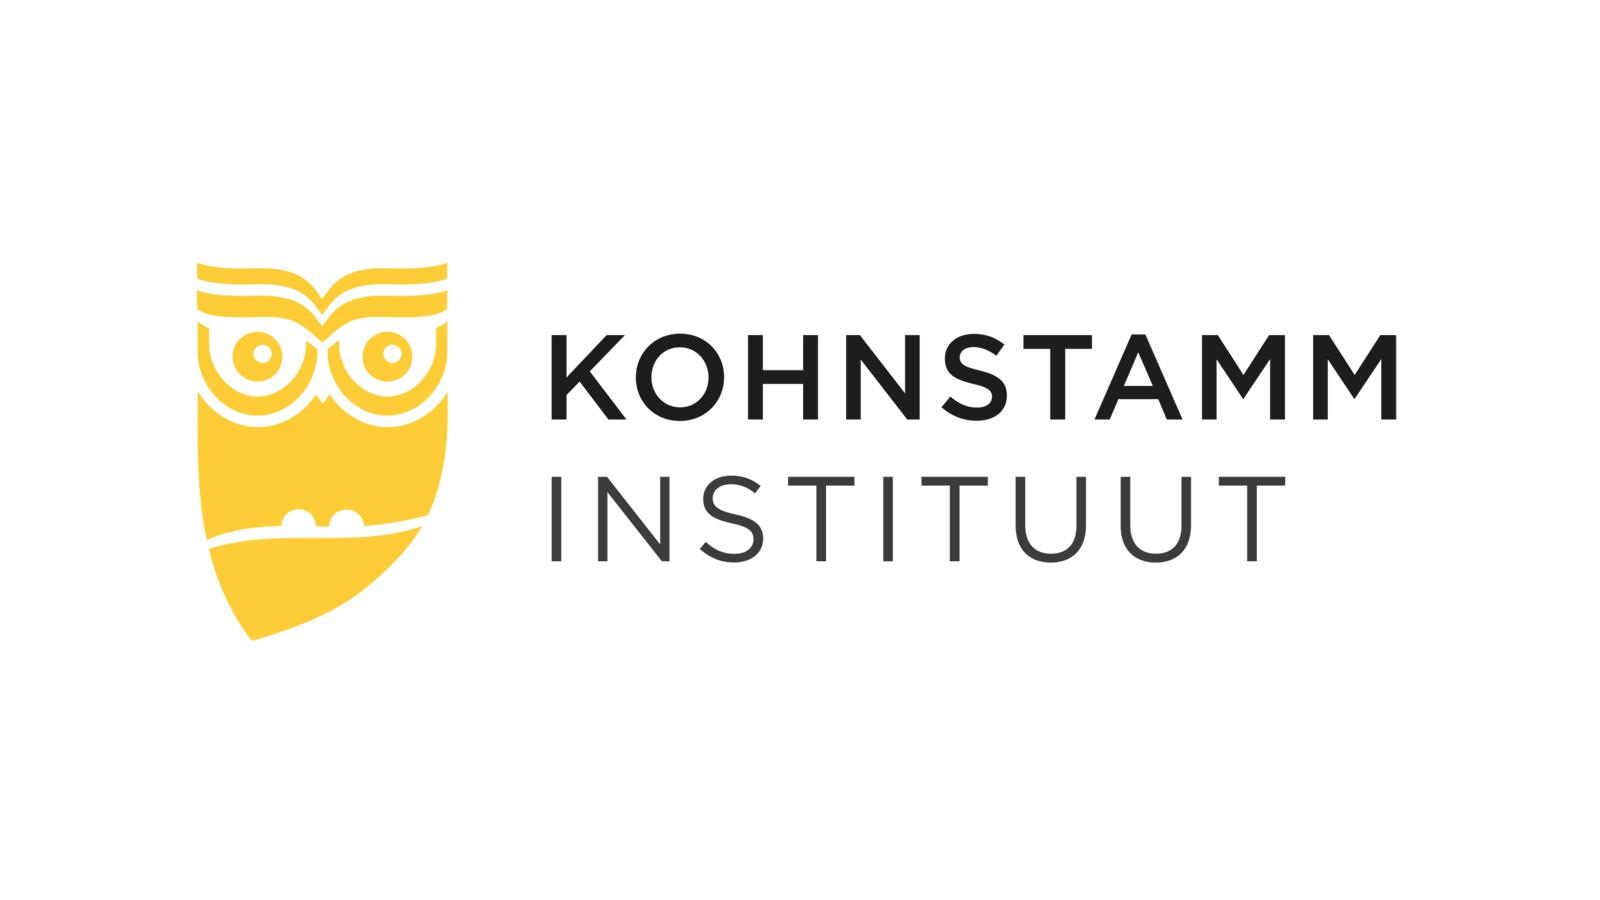 Logo Kohnstamm Instituut - Alternatief voorstel 01